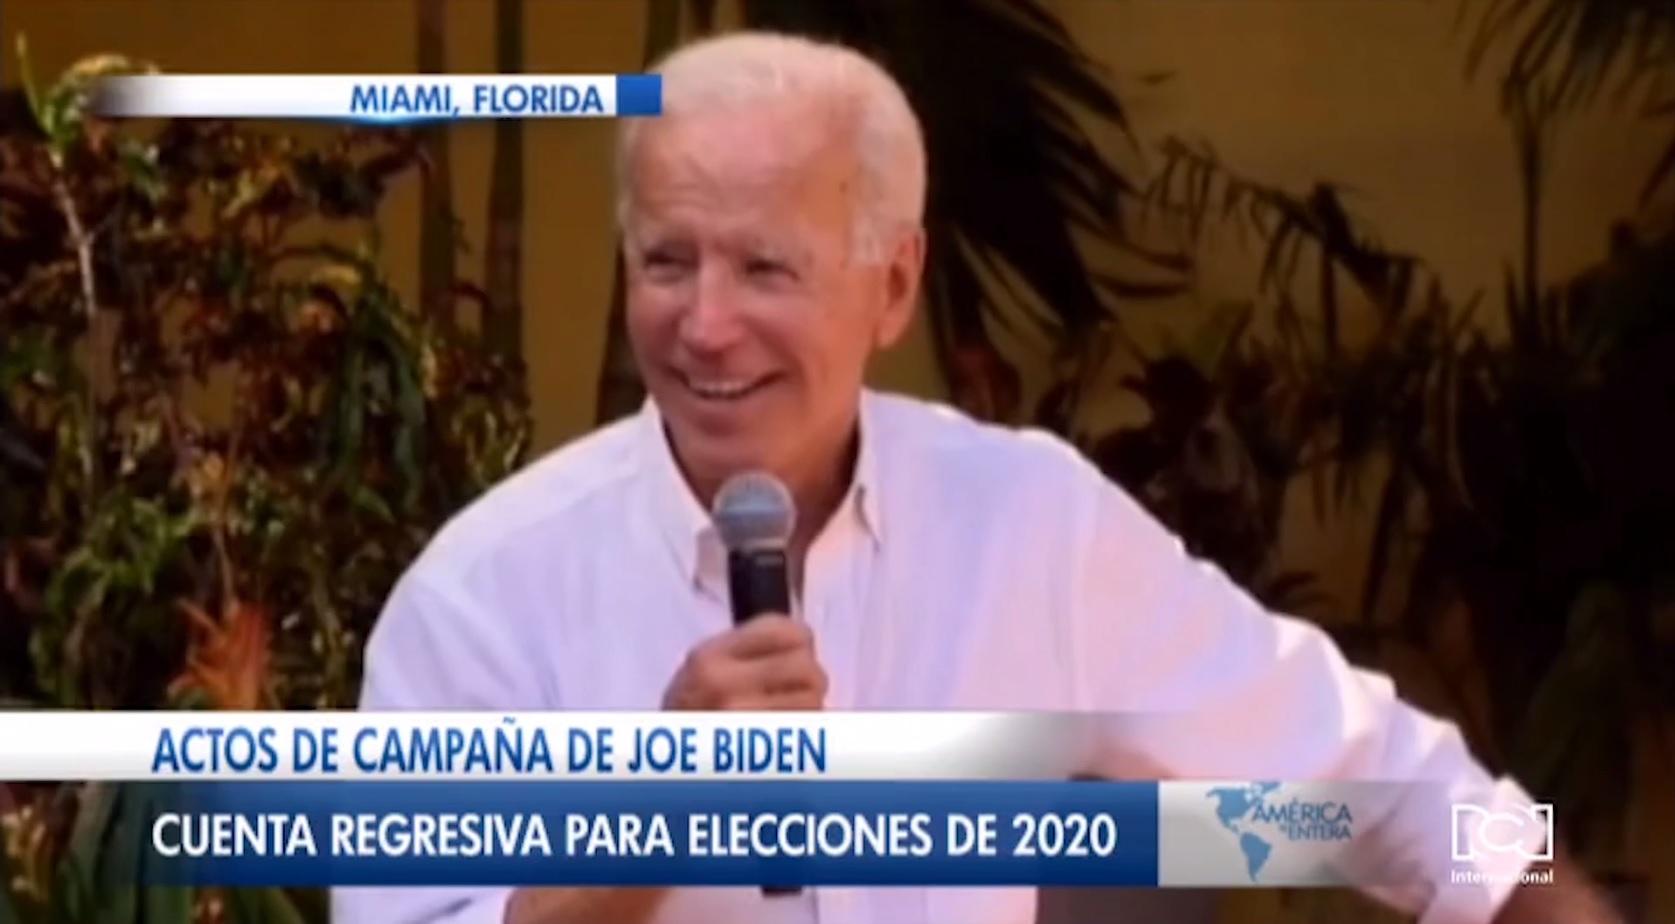 Joe Biden promete TPS para venezolanos si llega a la Casa Blanca